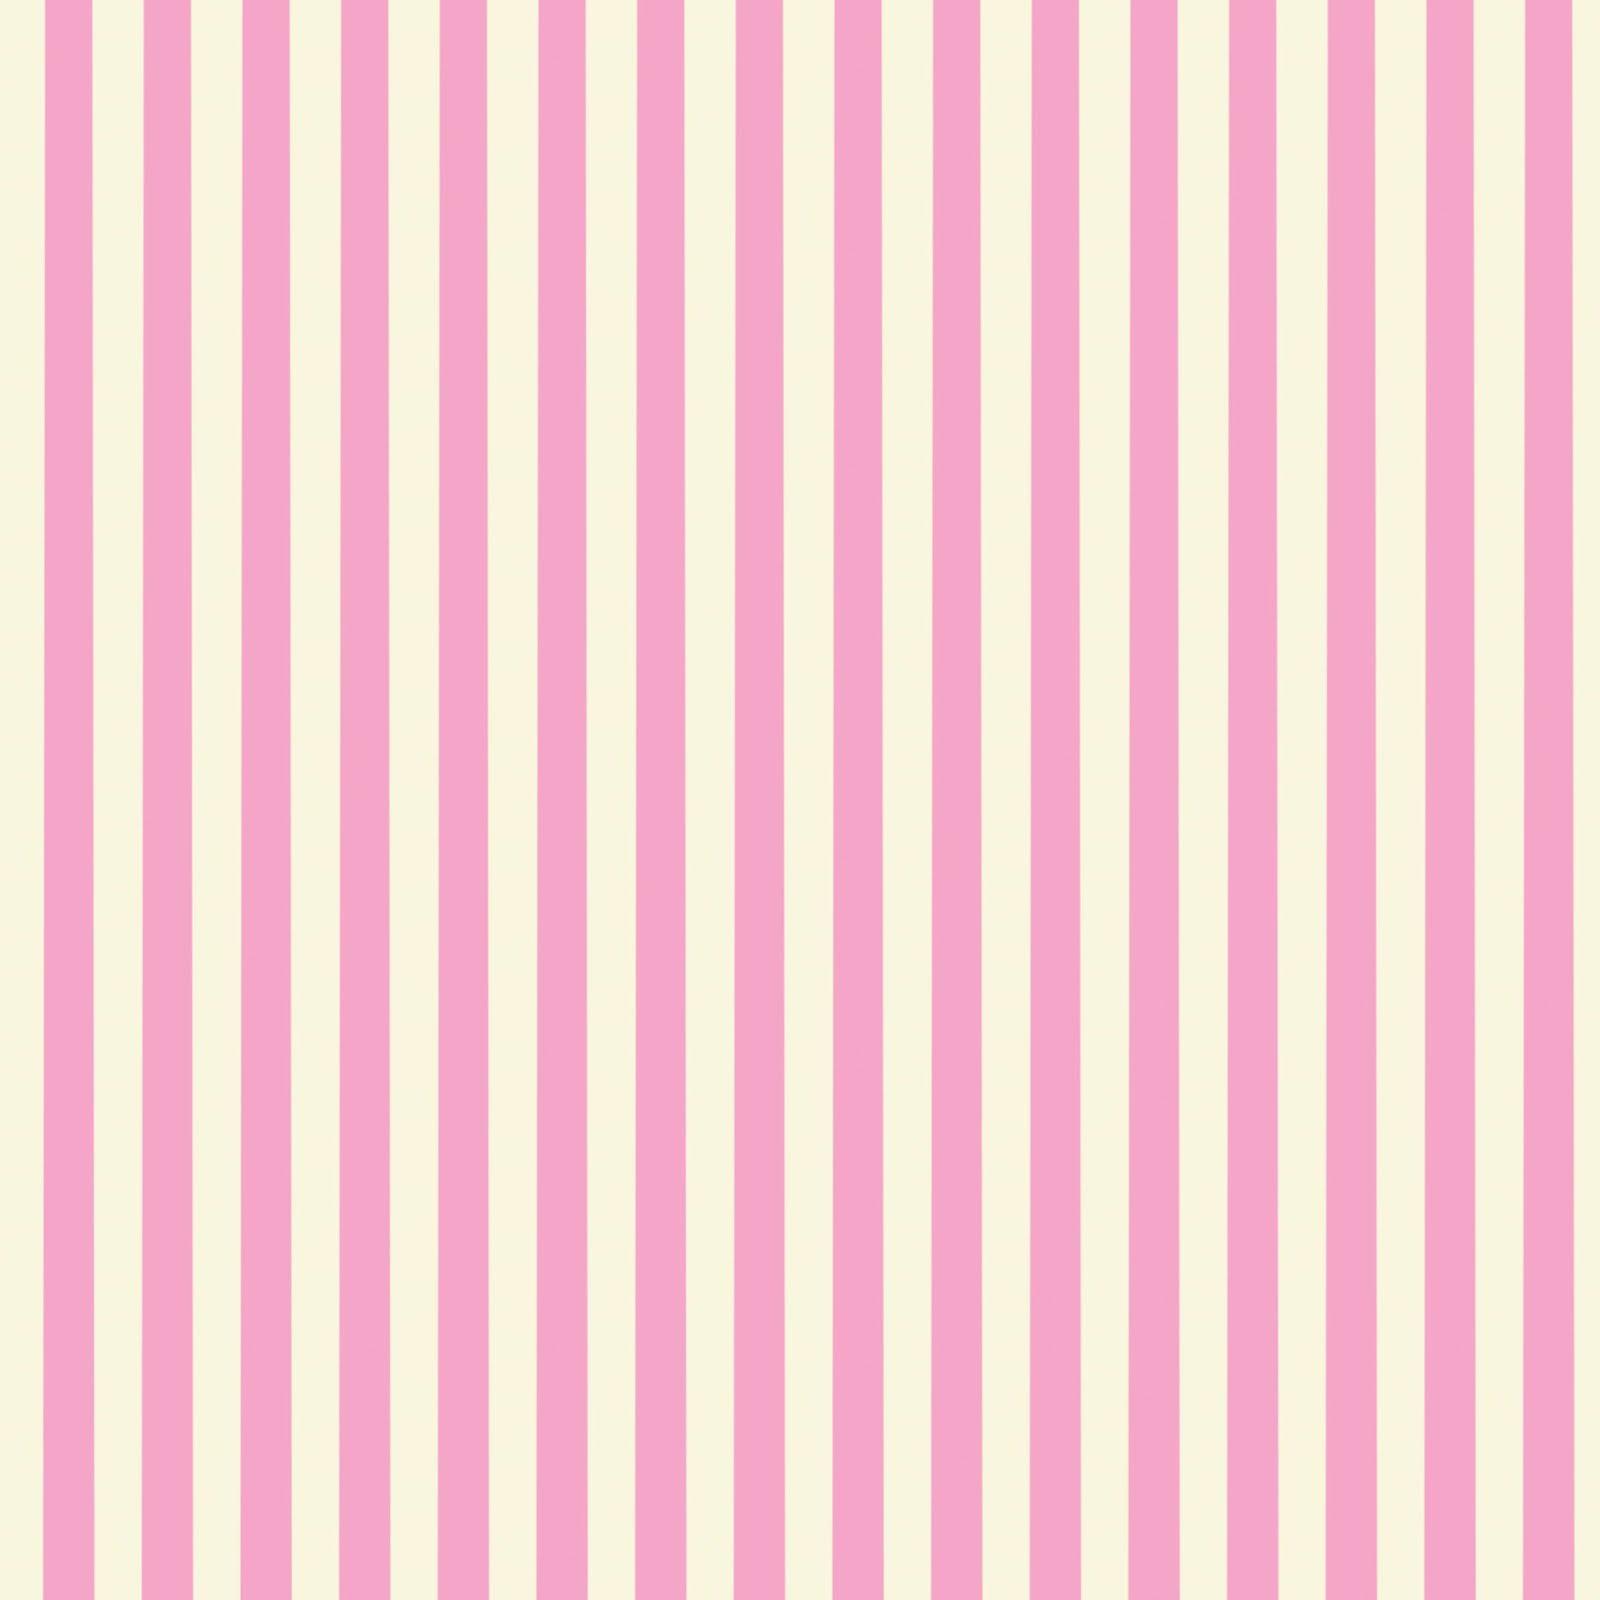 Scrapbook paper store - Free Digital Scrapbook Paper Pink And Cream Stripes